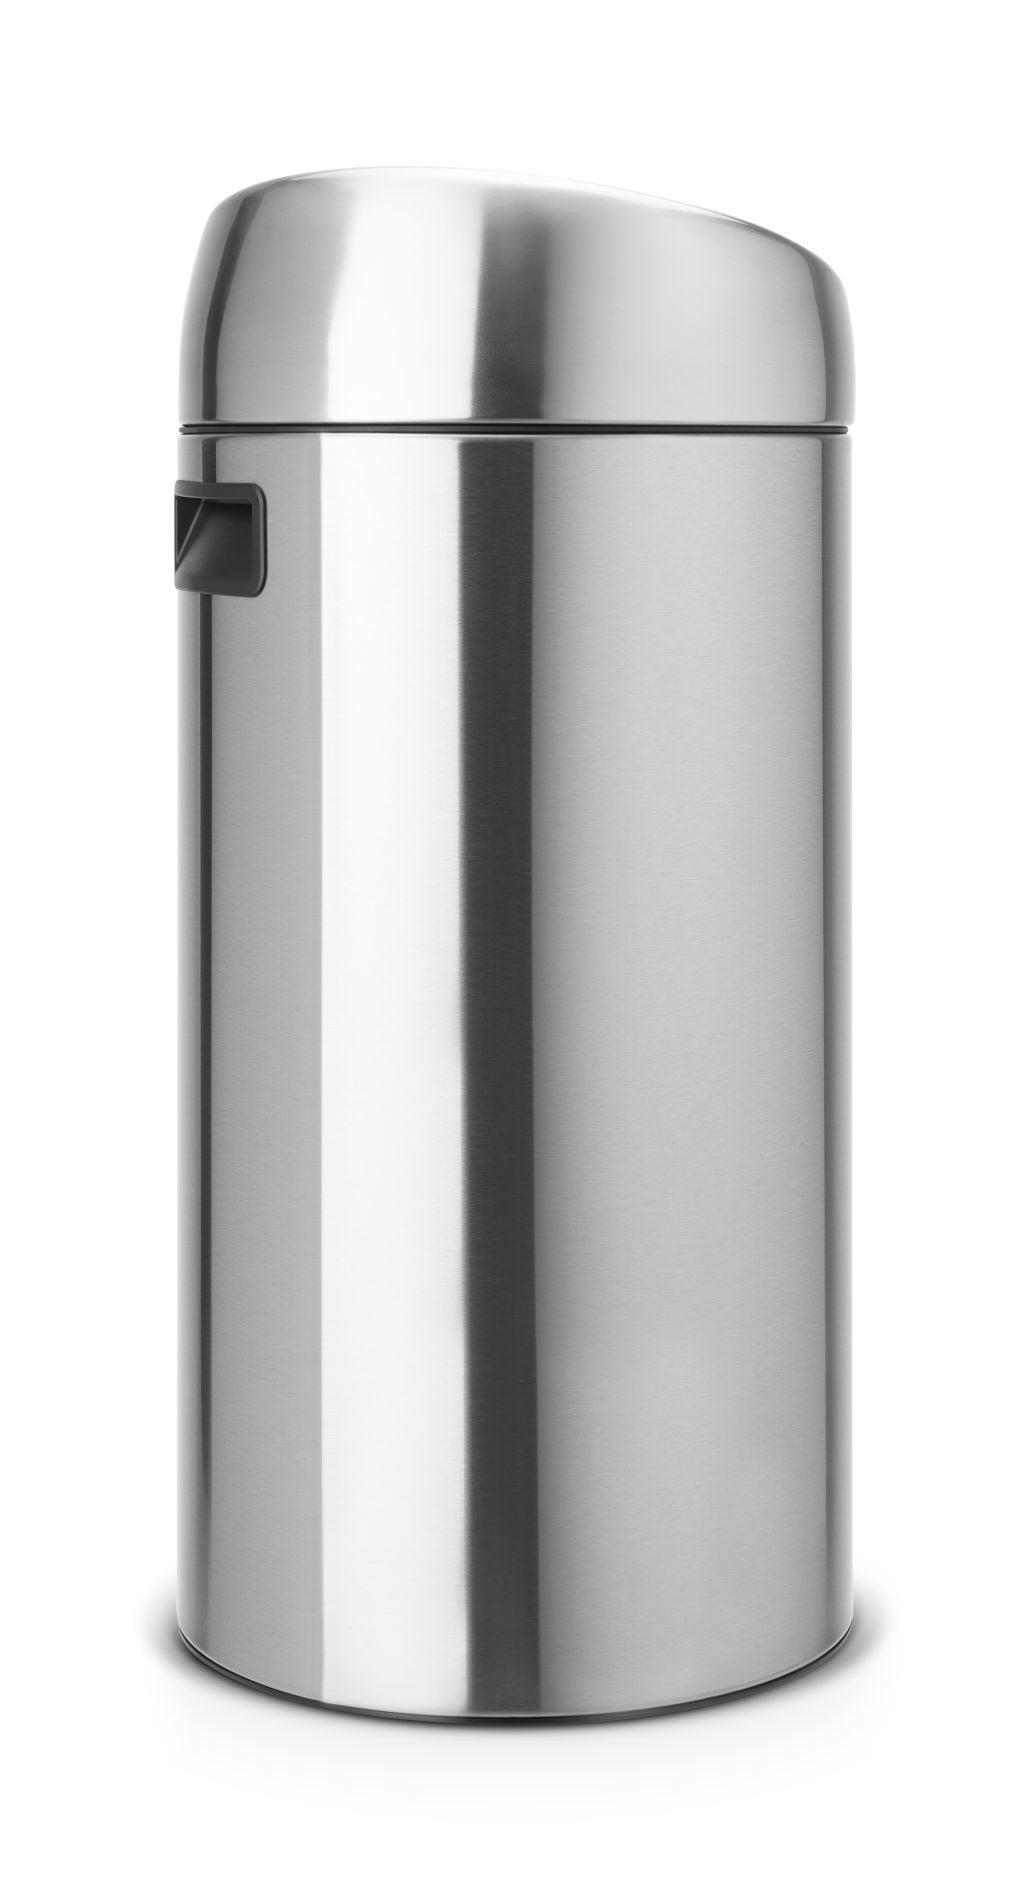 Touch Bin 45 Liter.Brabantia Touch Bin 45 Liter Matt Steel Coppens Warenhuis